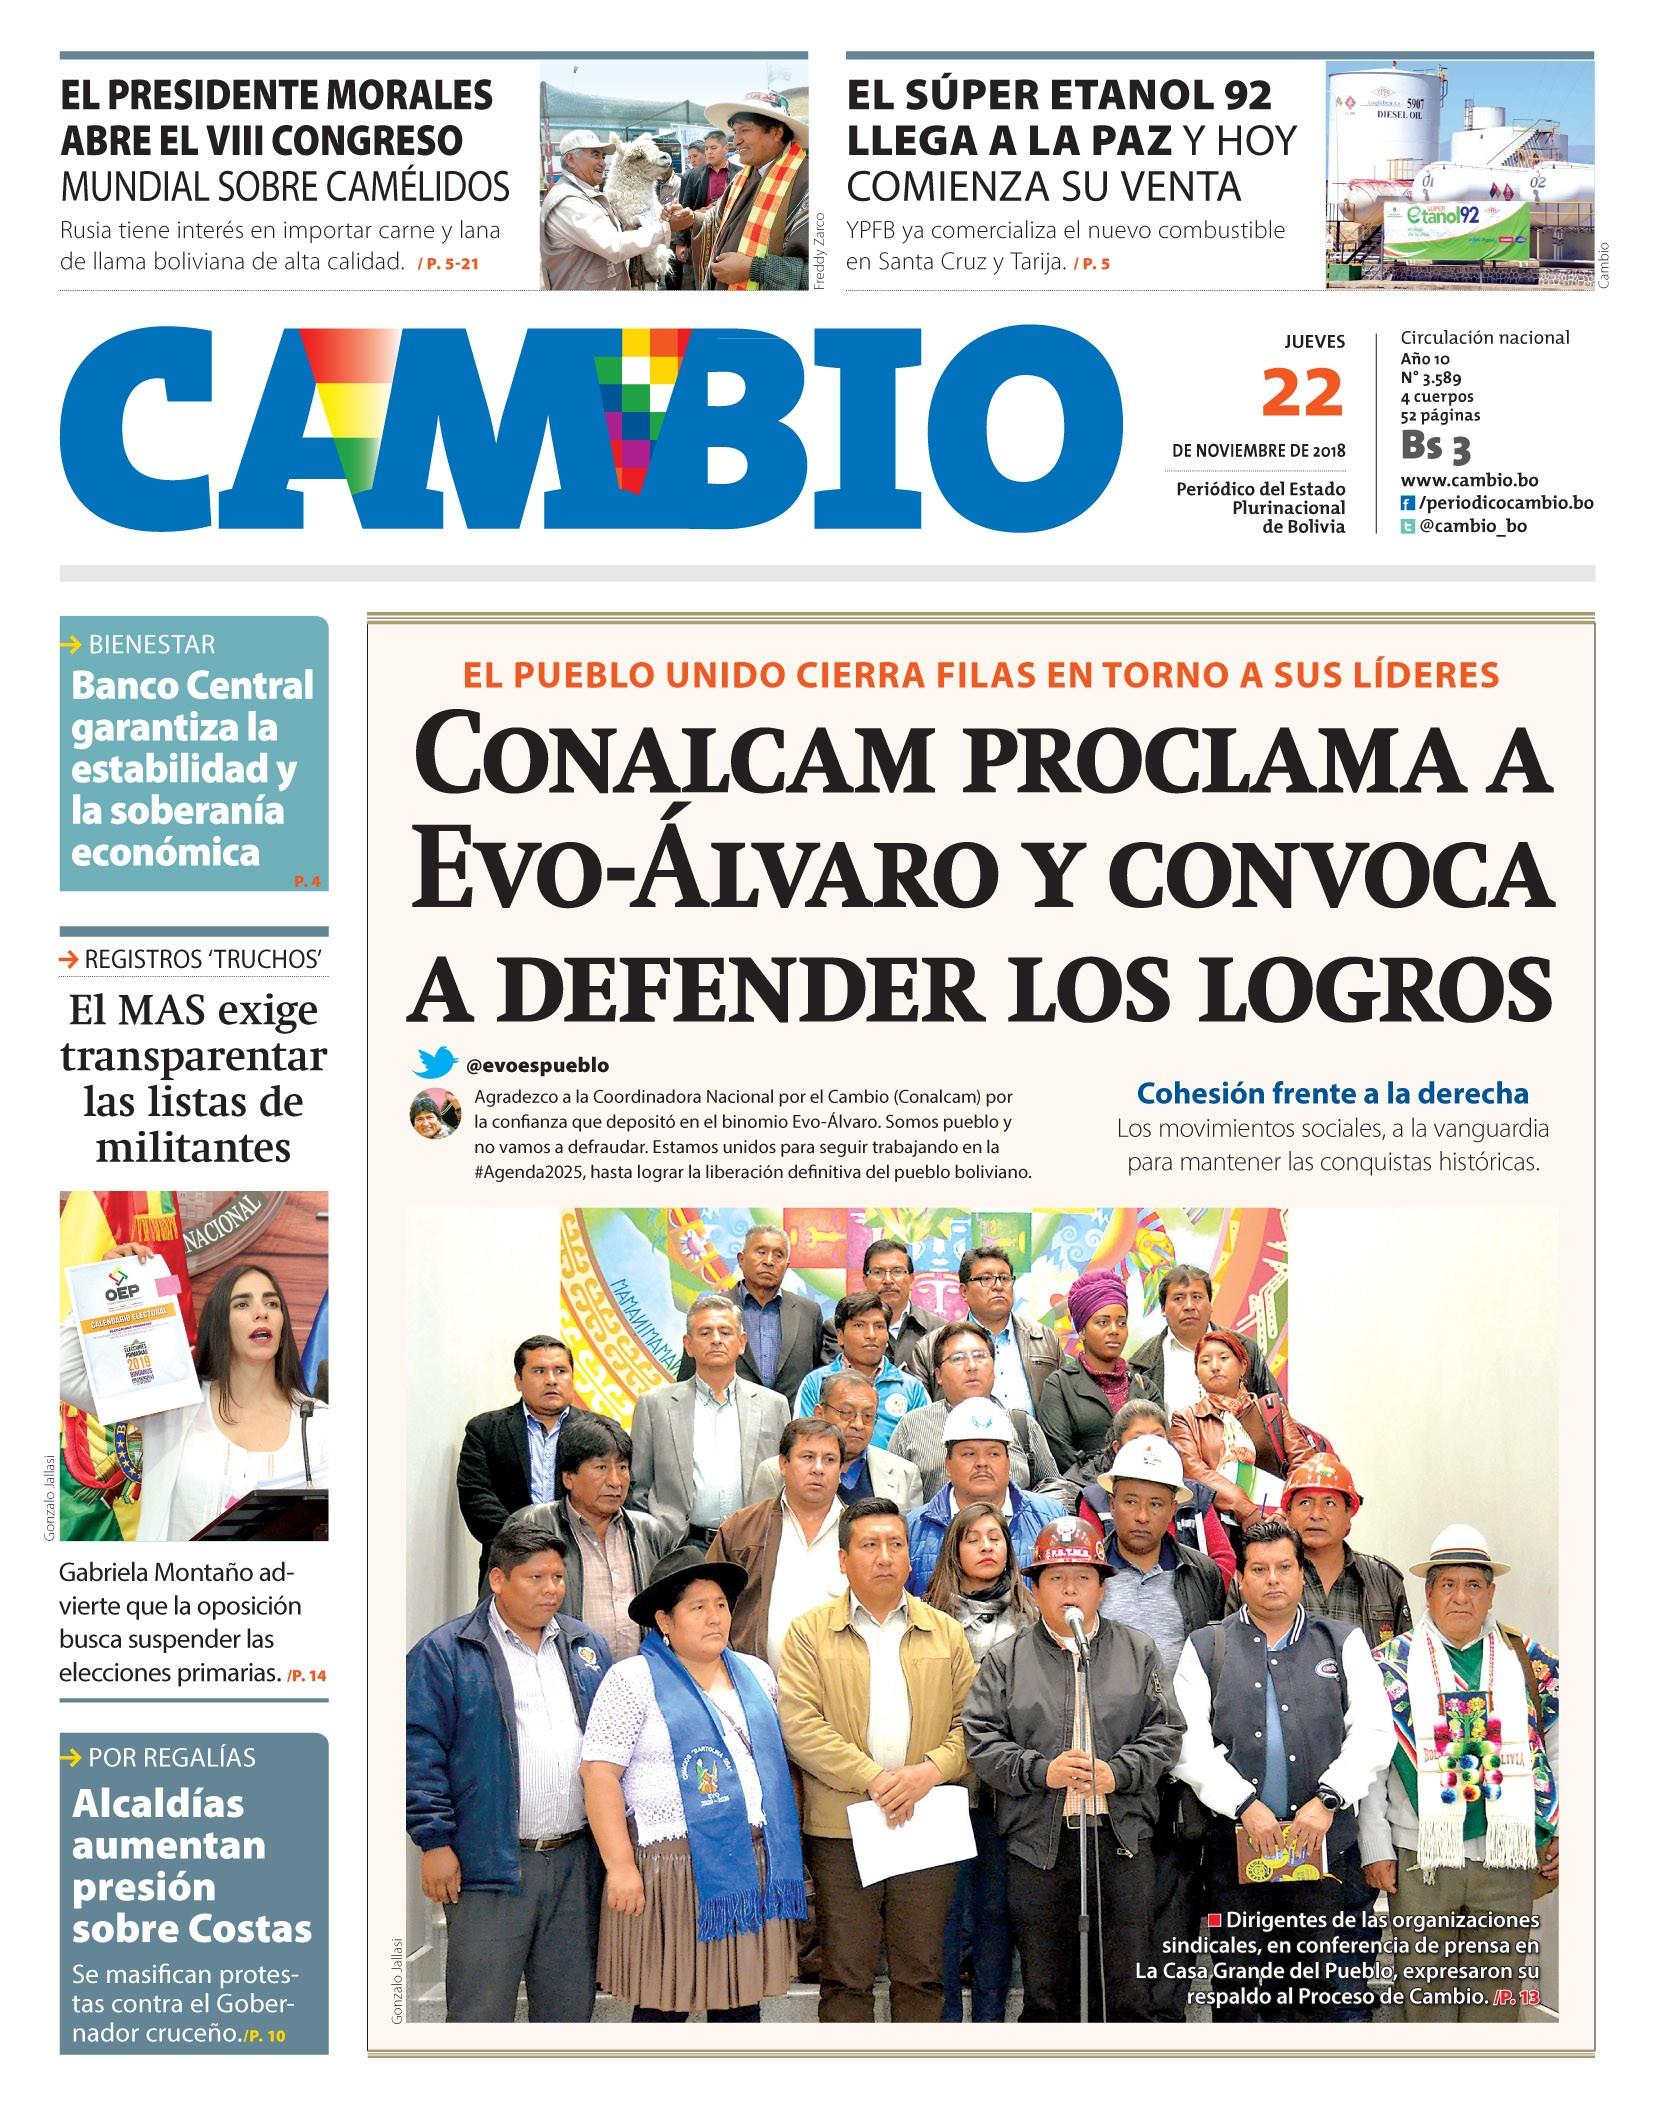 Calendario 2019 Oficial Mexico Más Actual Abi Agencia Boliviana De Informaci³n V2018 Of Calendario 2019 Oficial Mexico Más Populares Pin De Luiis Lunaa En Barcelona Pinterest